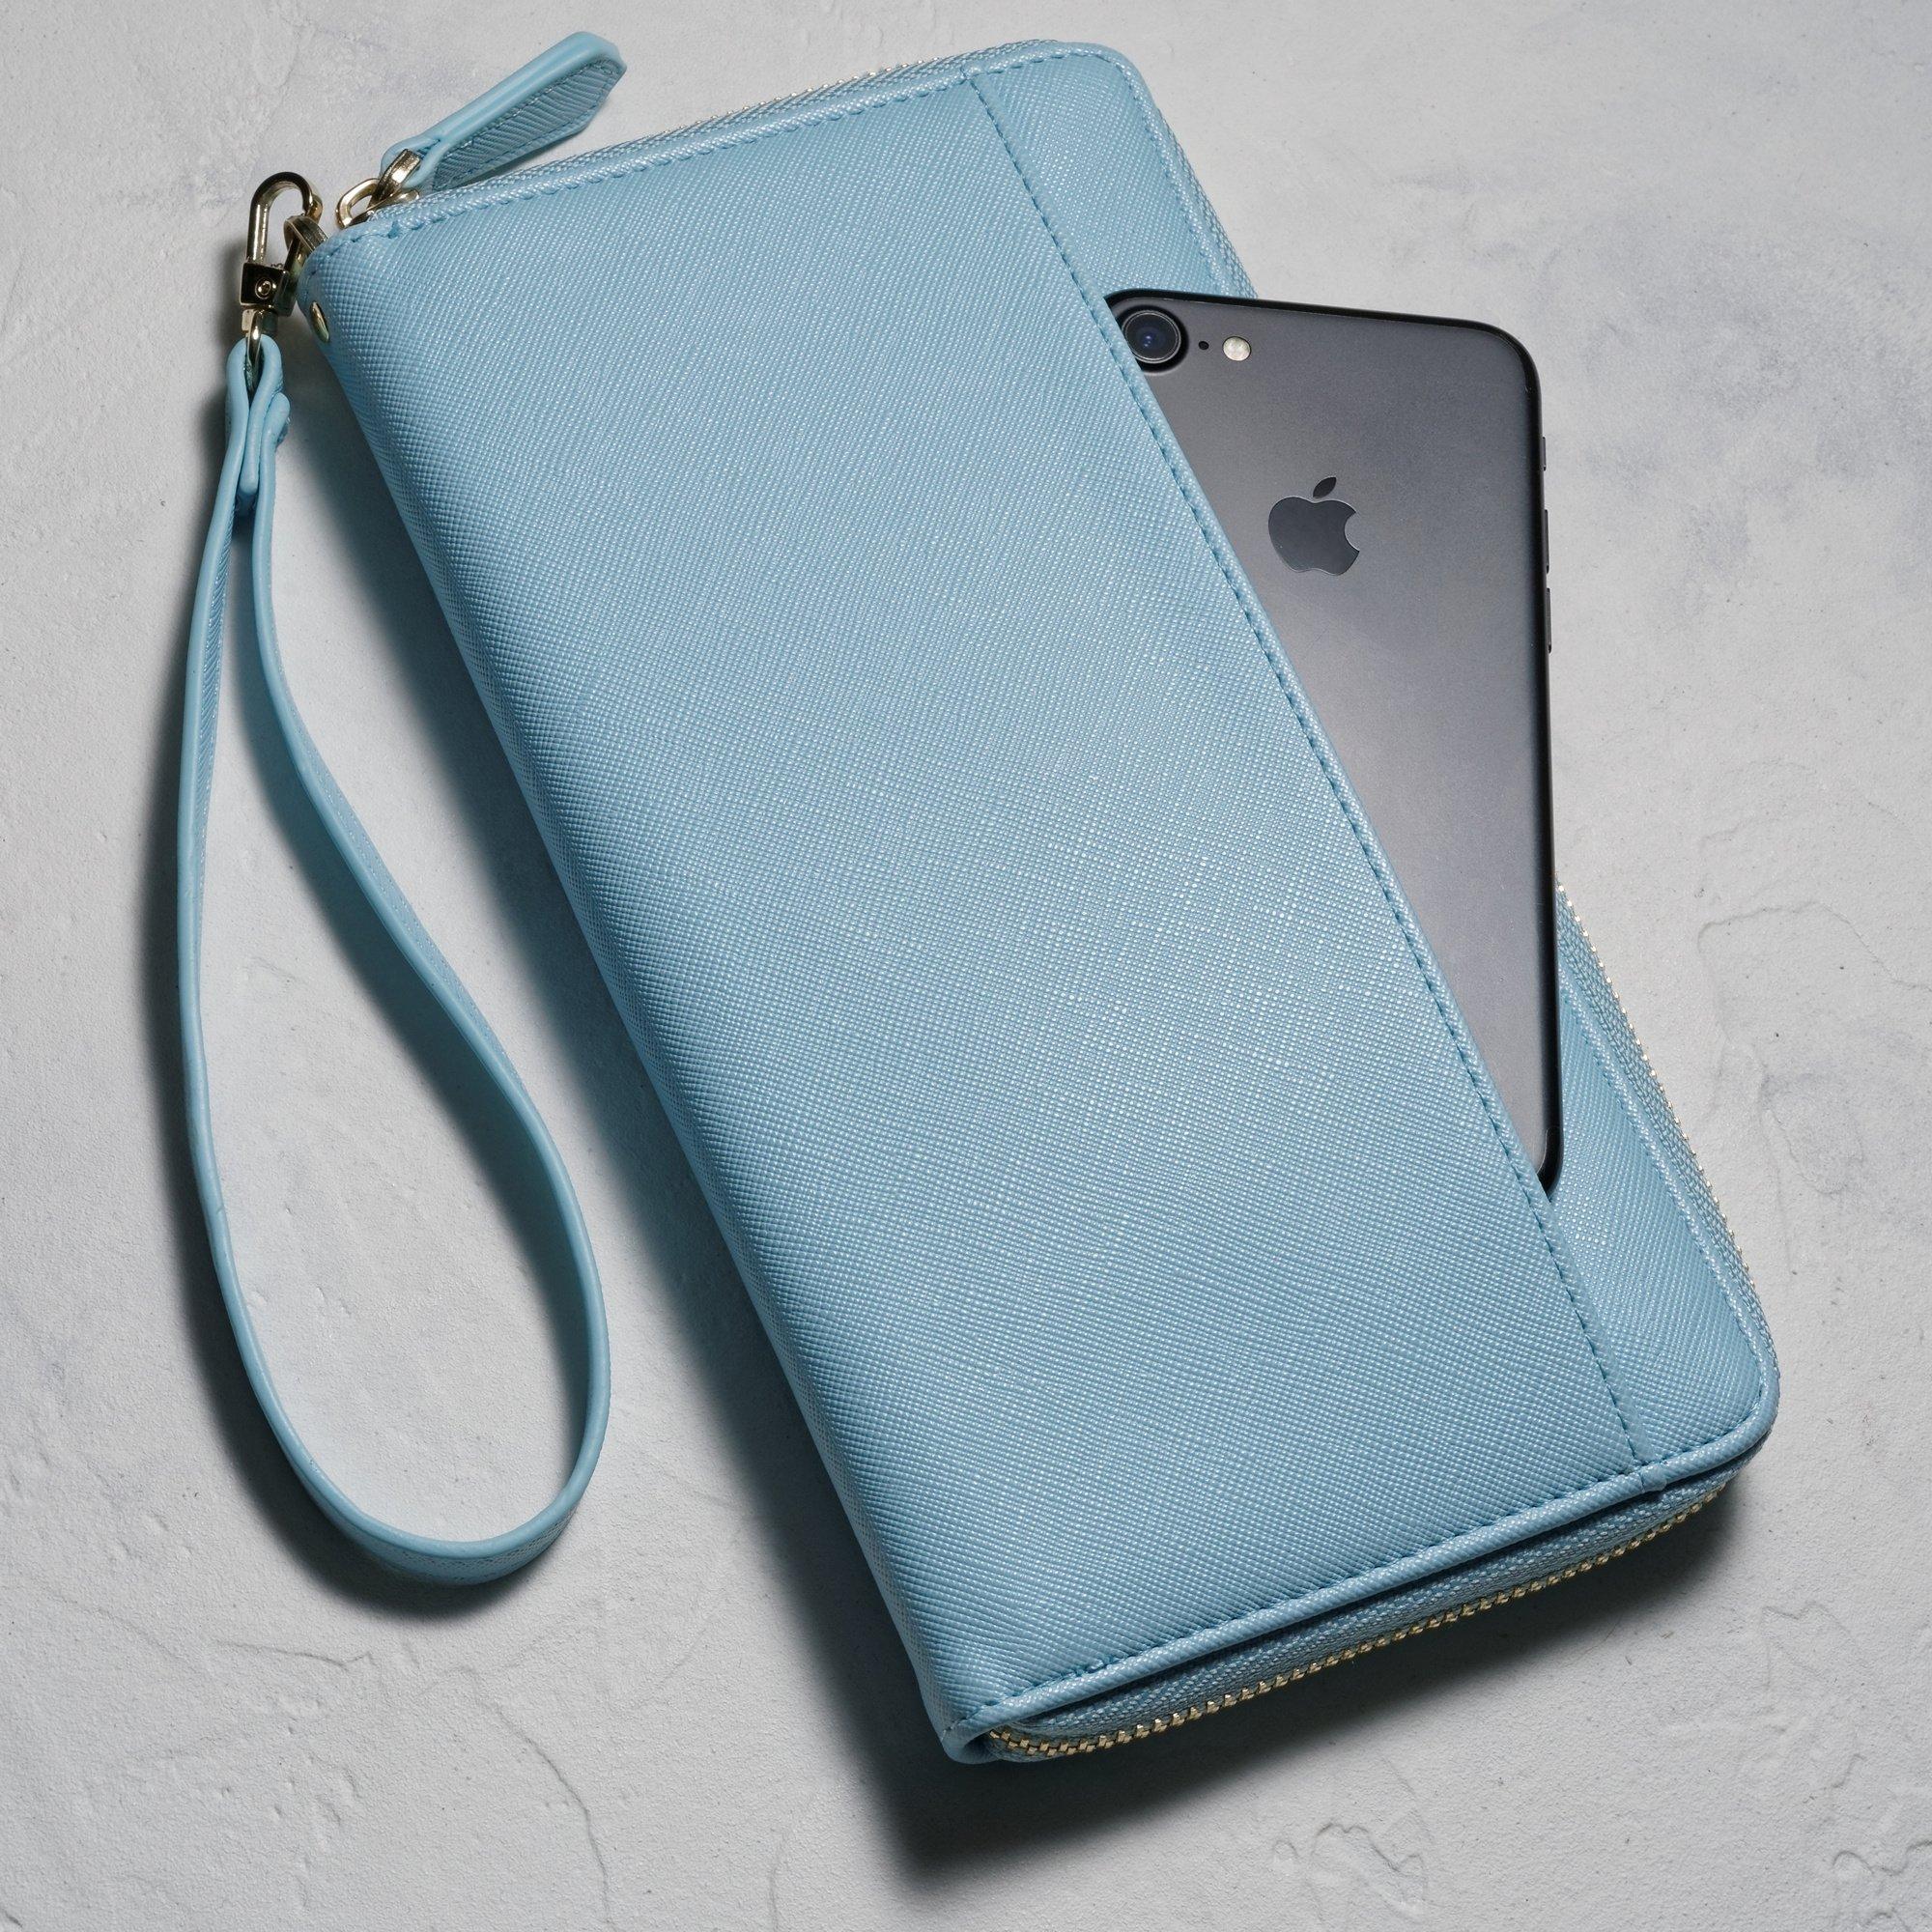 Travel Document Organizer & RFID Passport Wallet Case, Family Passport Holder Id (Blue Sky) by Apadi (Image #5)